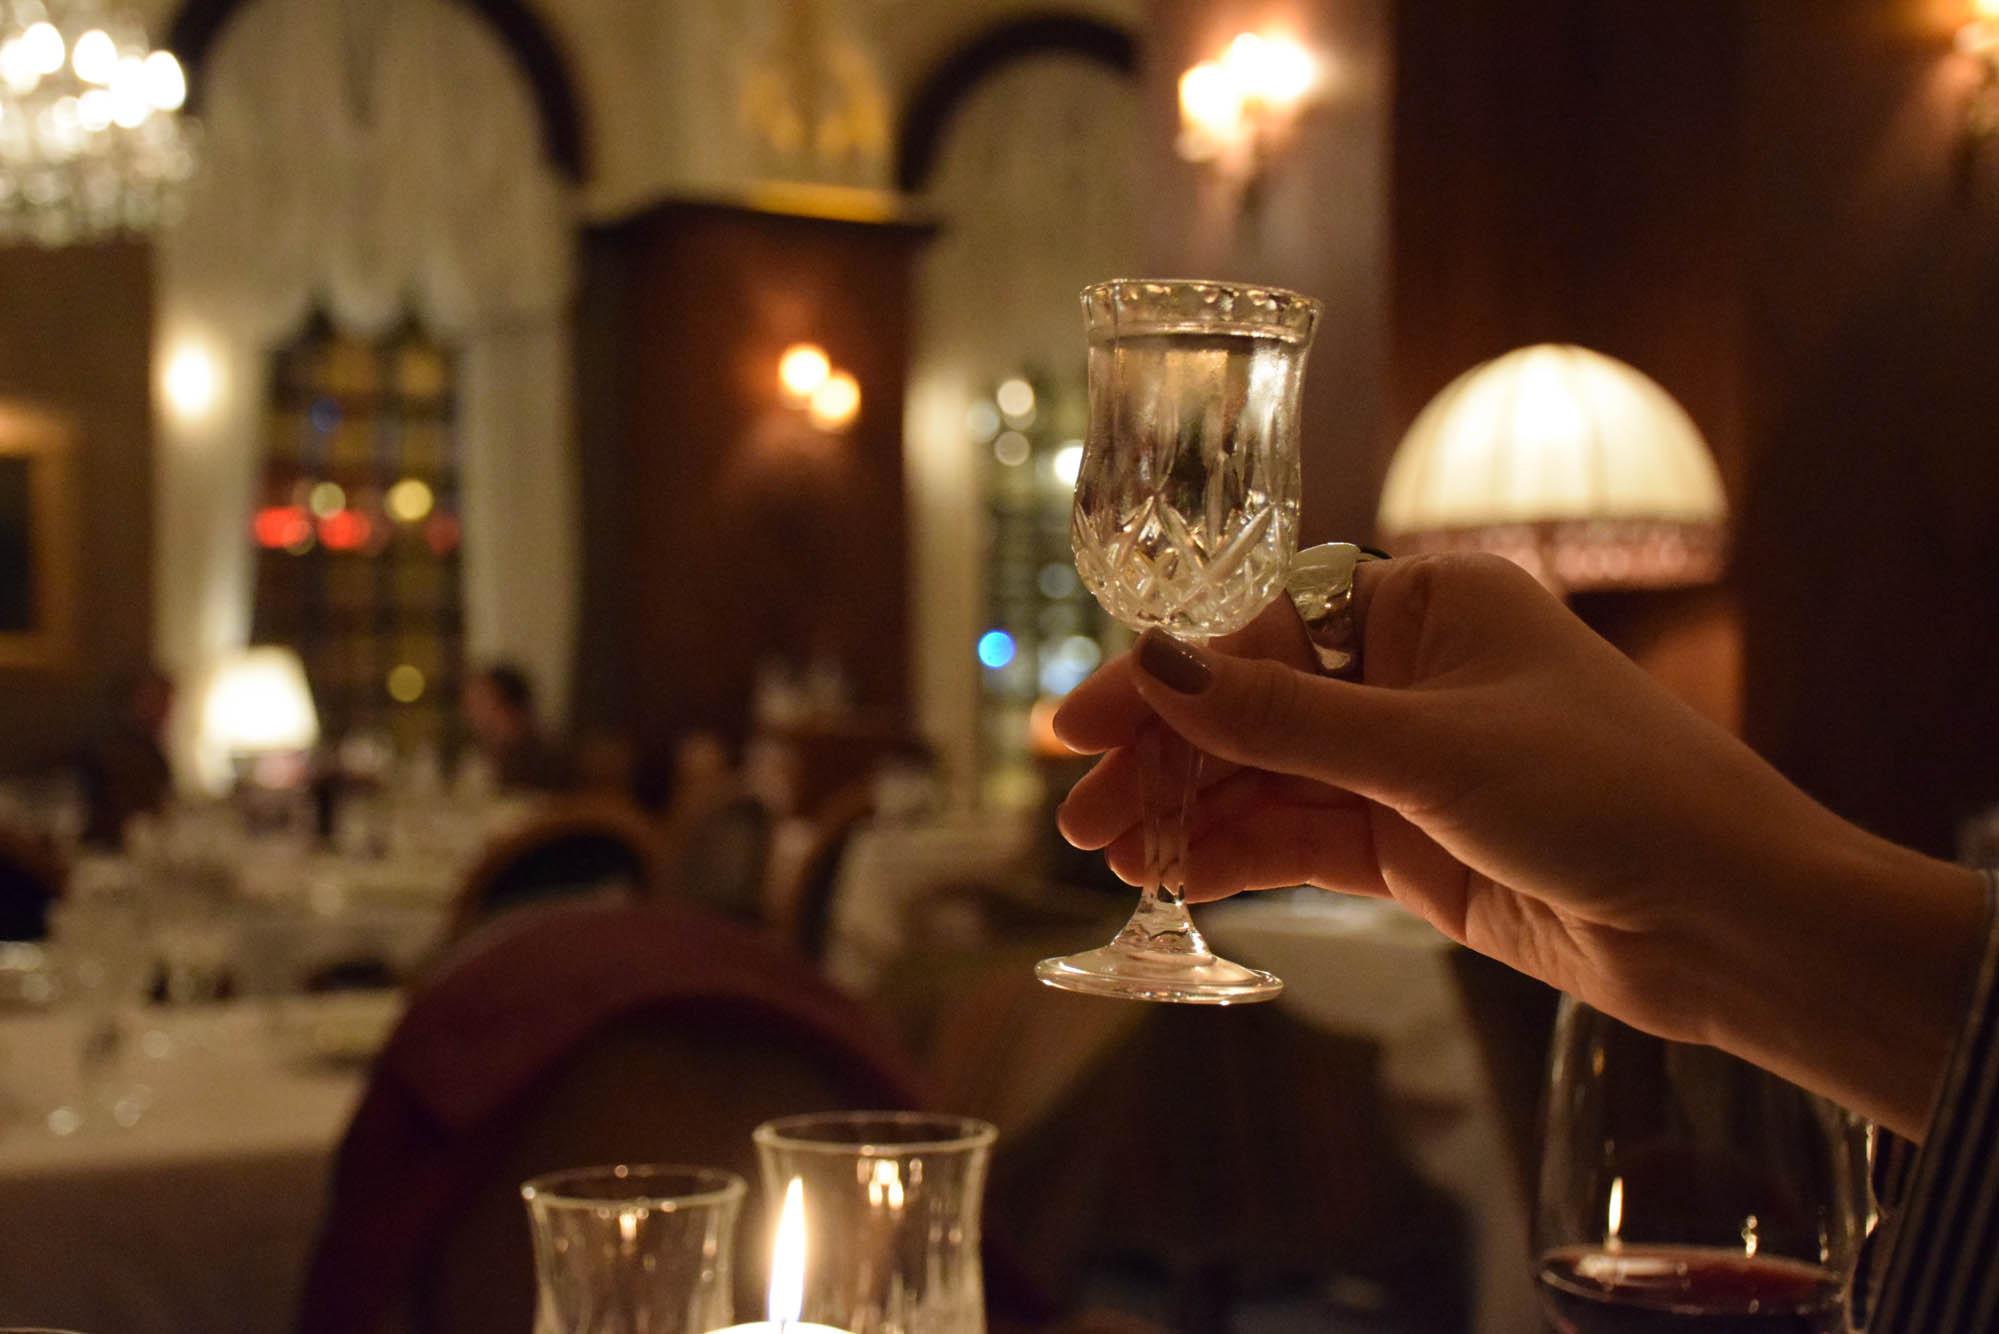 TZAR Restaurant st petersburg russia where to eat vodka